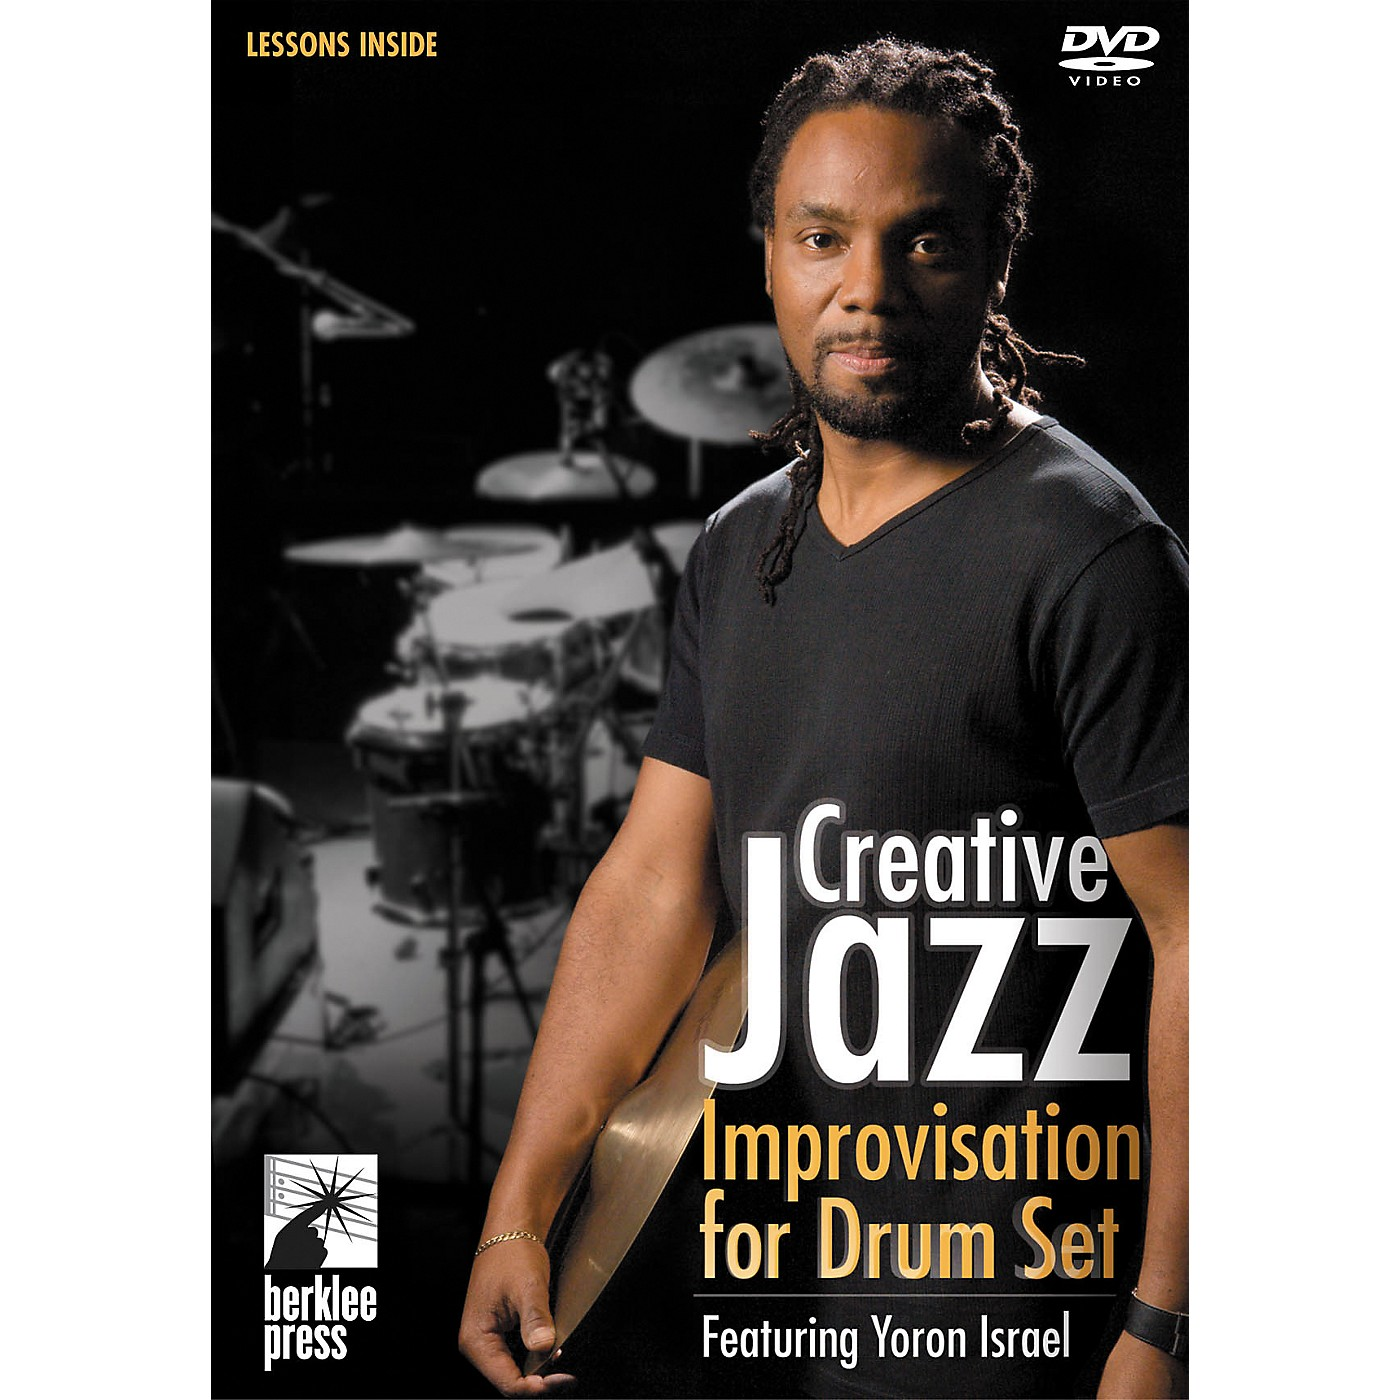 Berklee Press Creative Jazz Improvisation for Drum Set DVD with Yoron Israel thumbnail